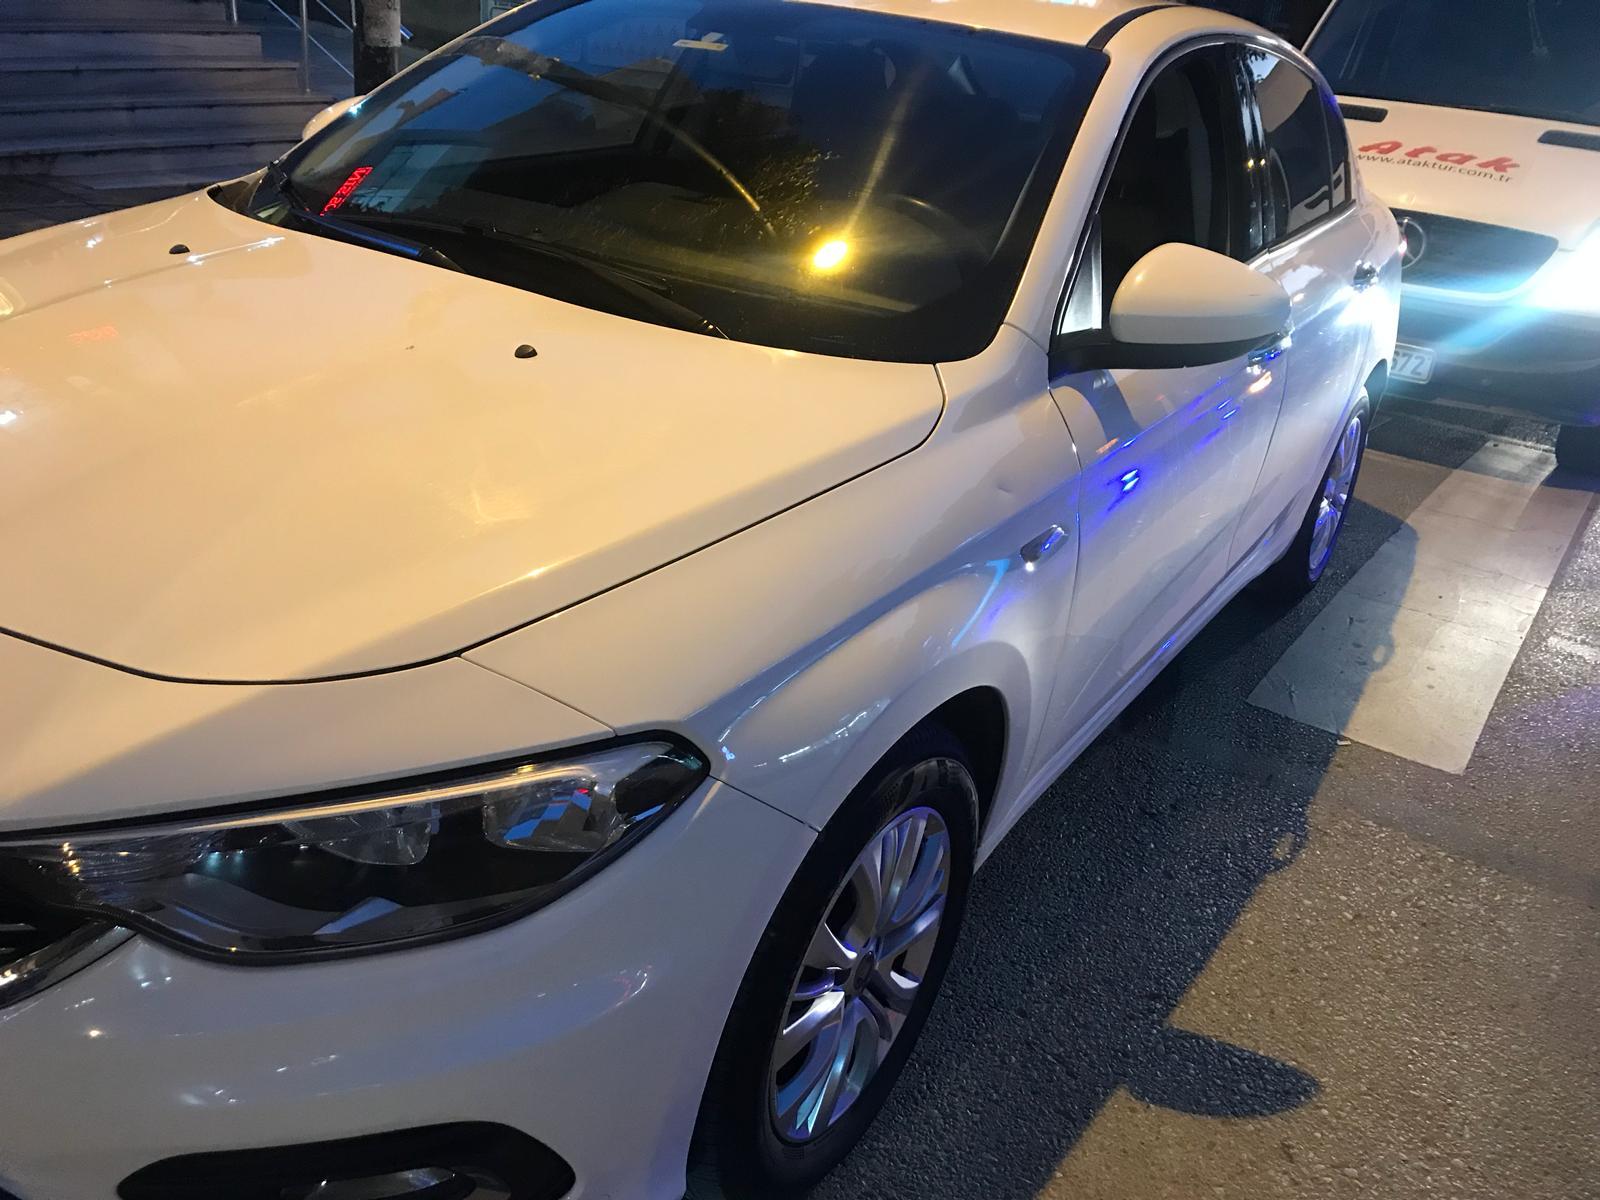 FIAT Egea 2016 Model Dizel Manuel Vites Kiralik Araç - 8A2F